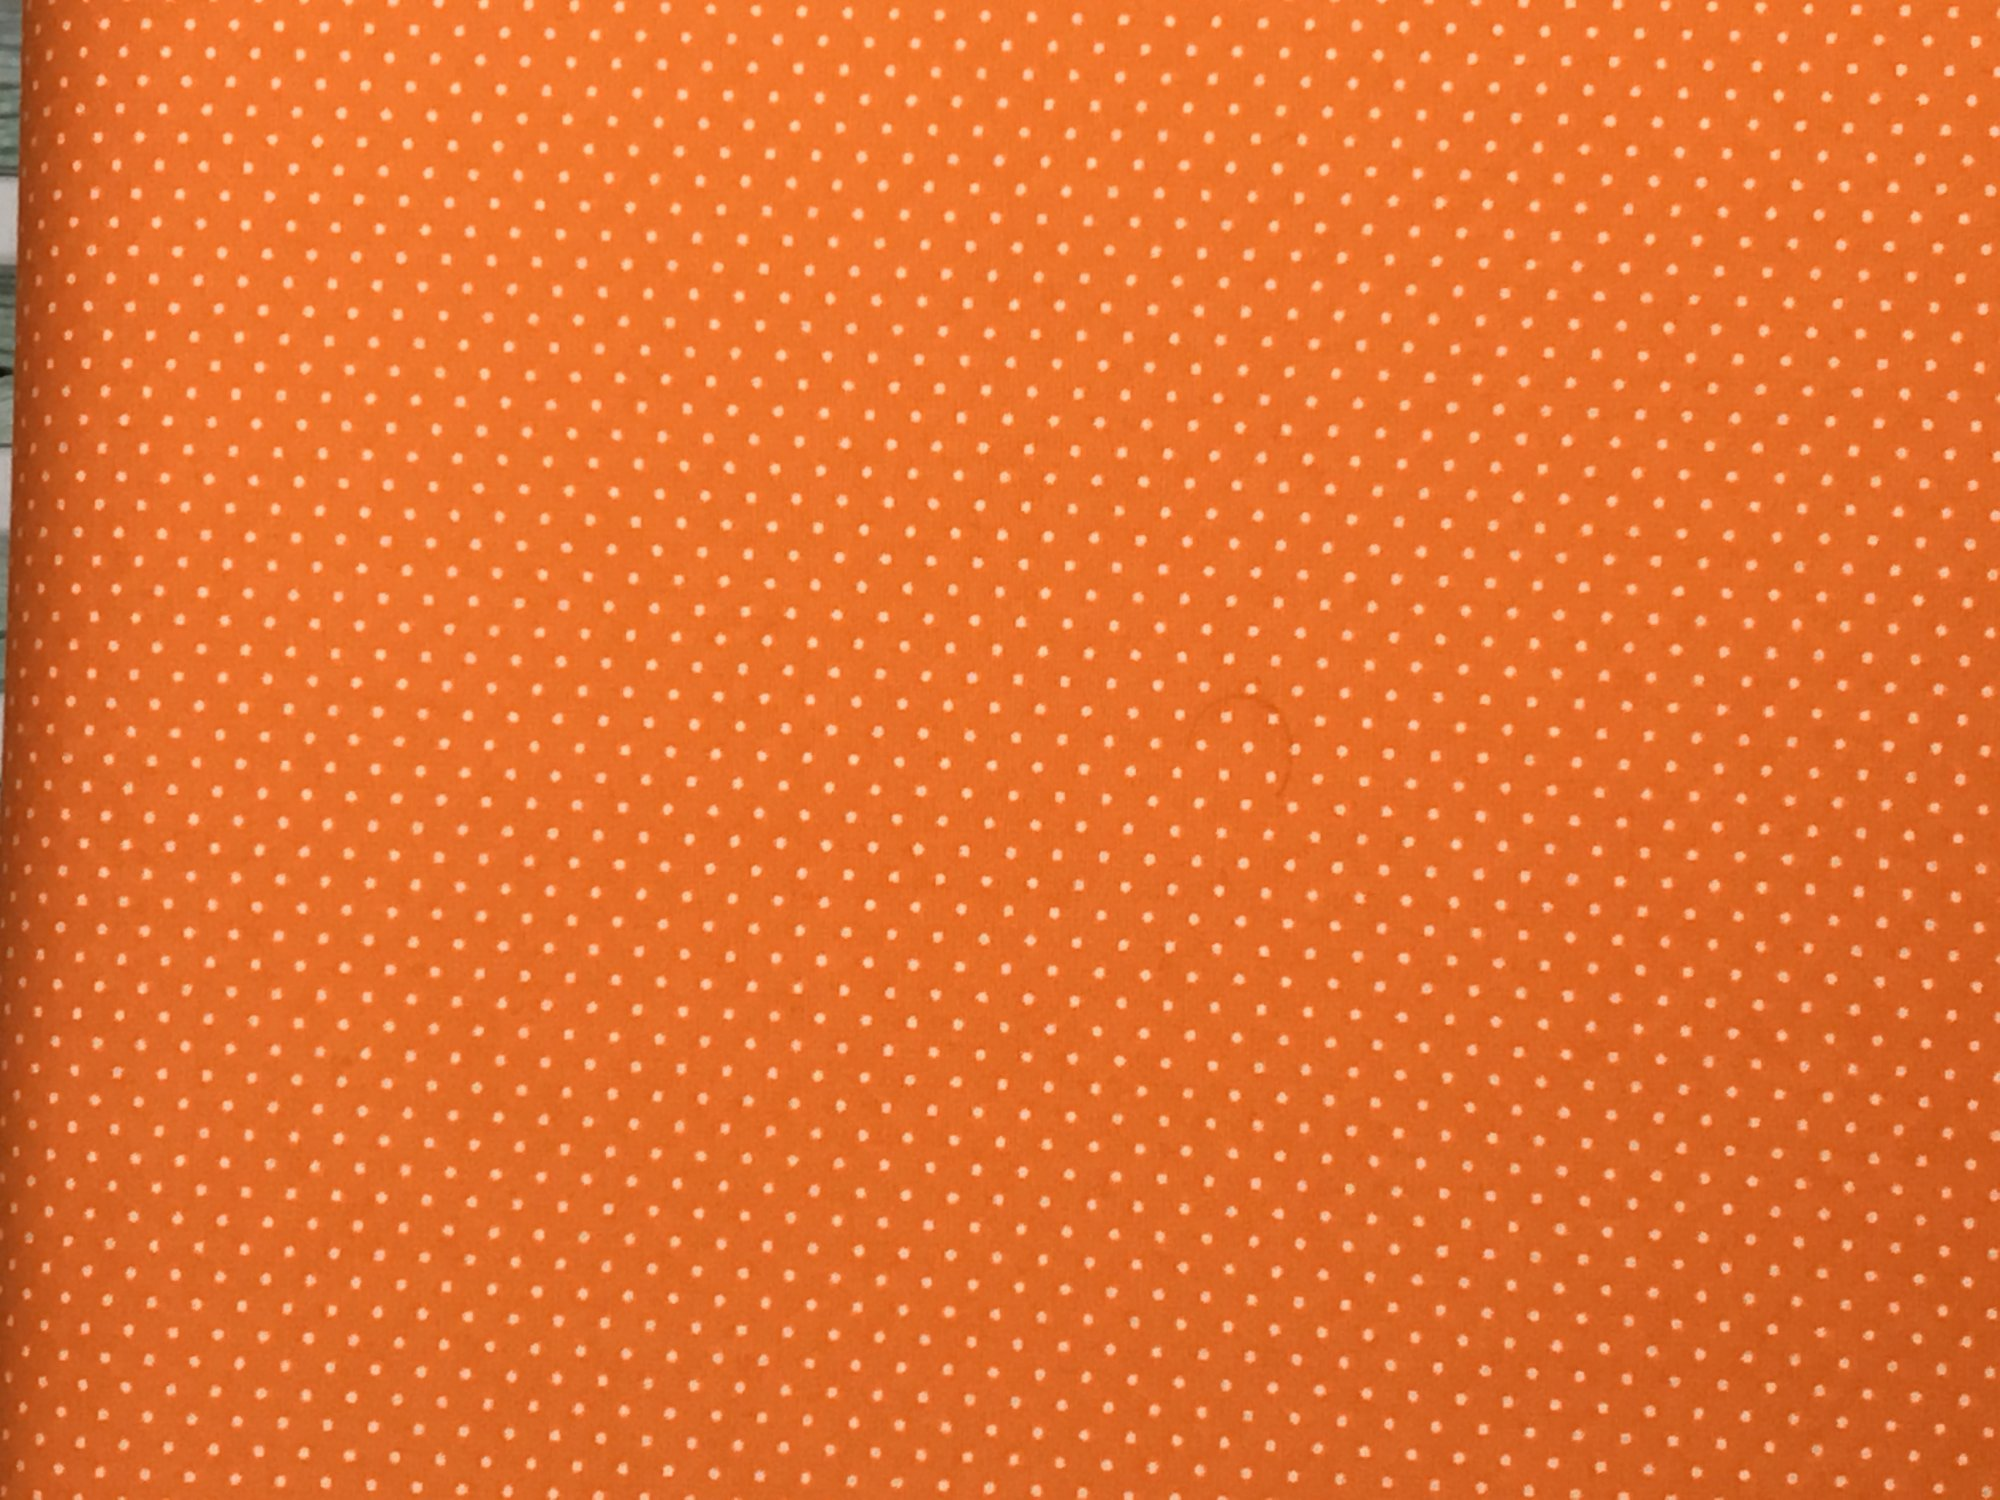 Adaman Coast - Tropical Papaya - White Micro Dot on Orange